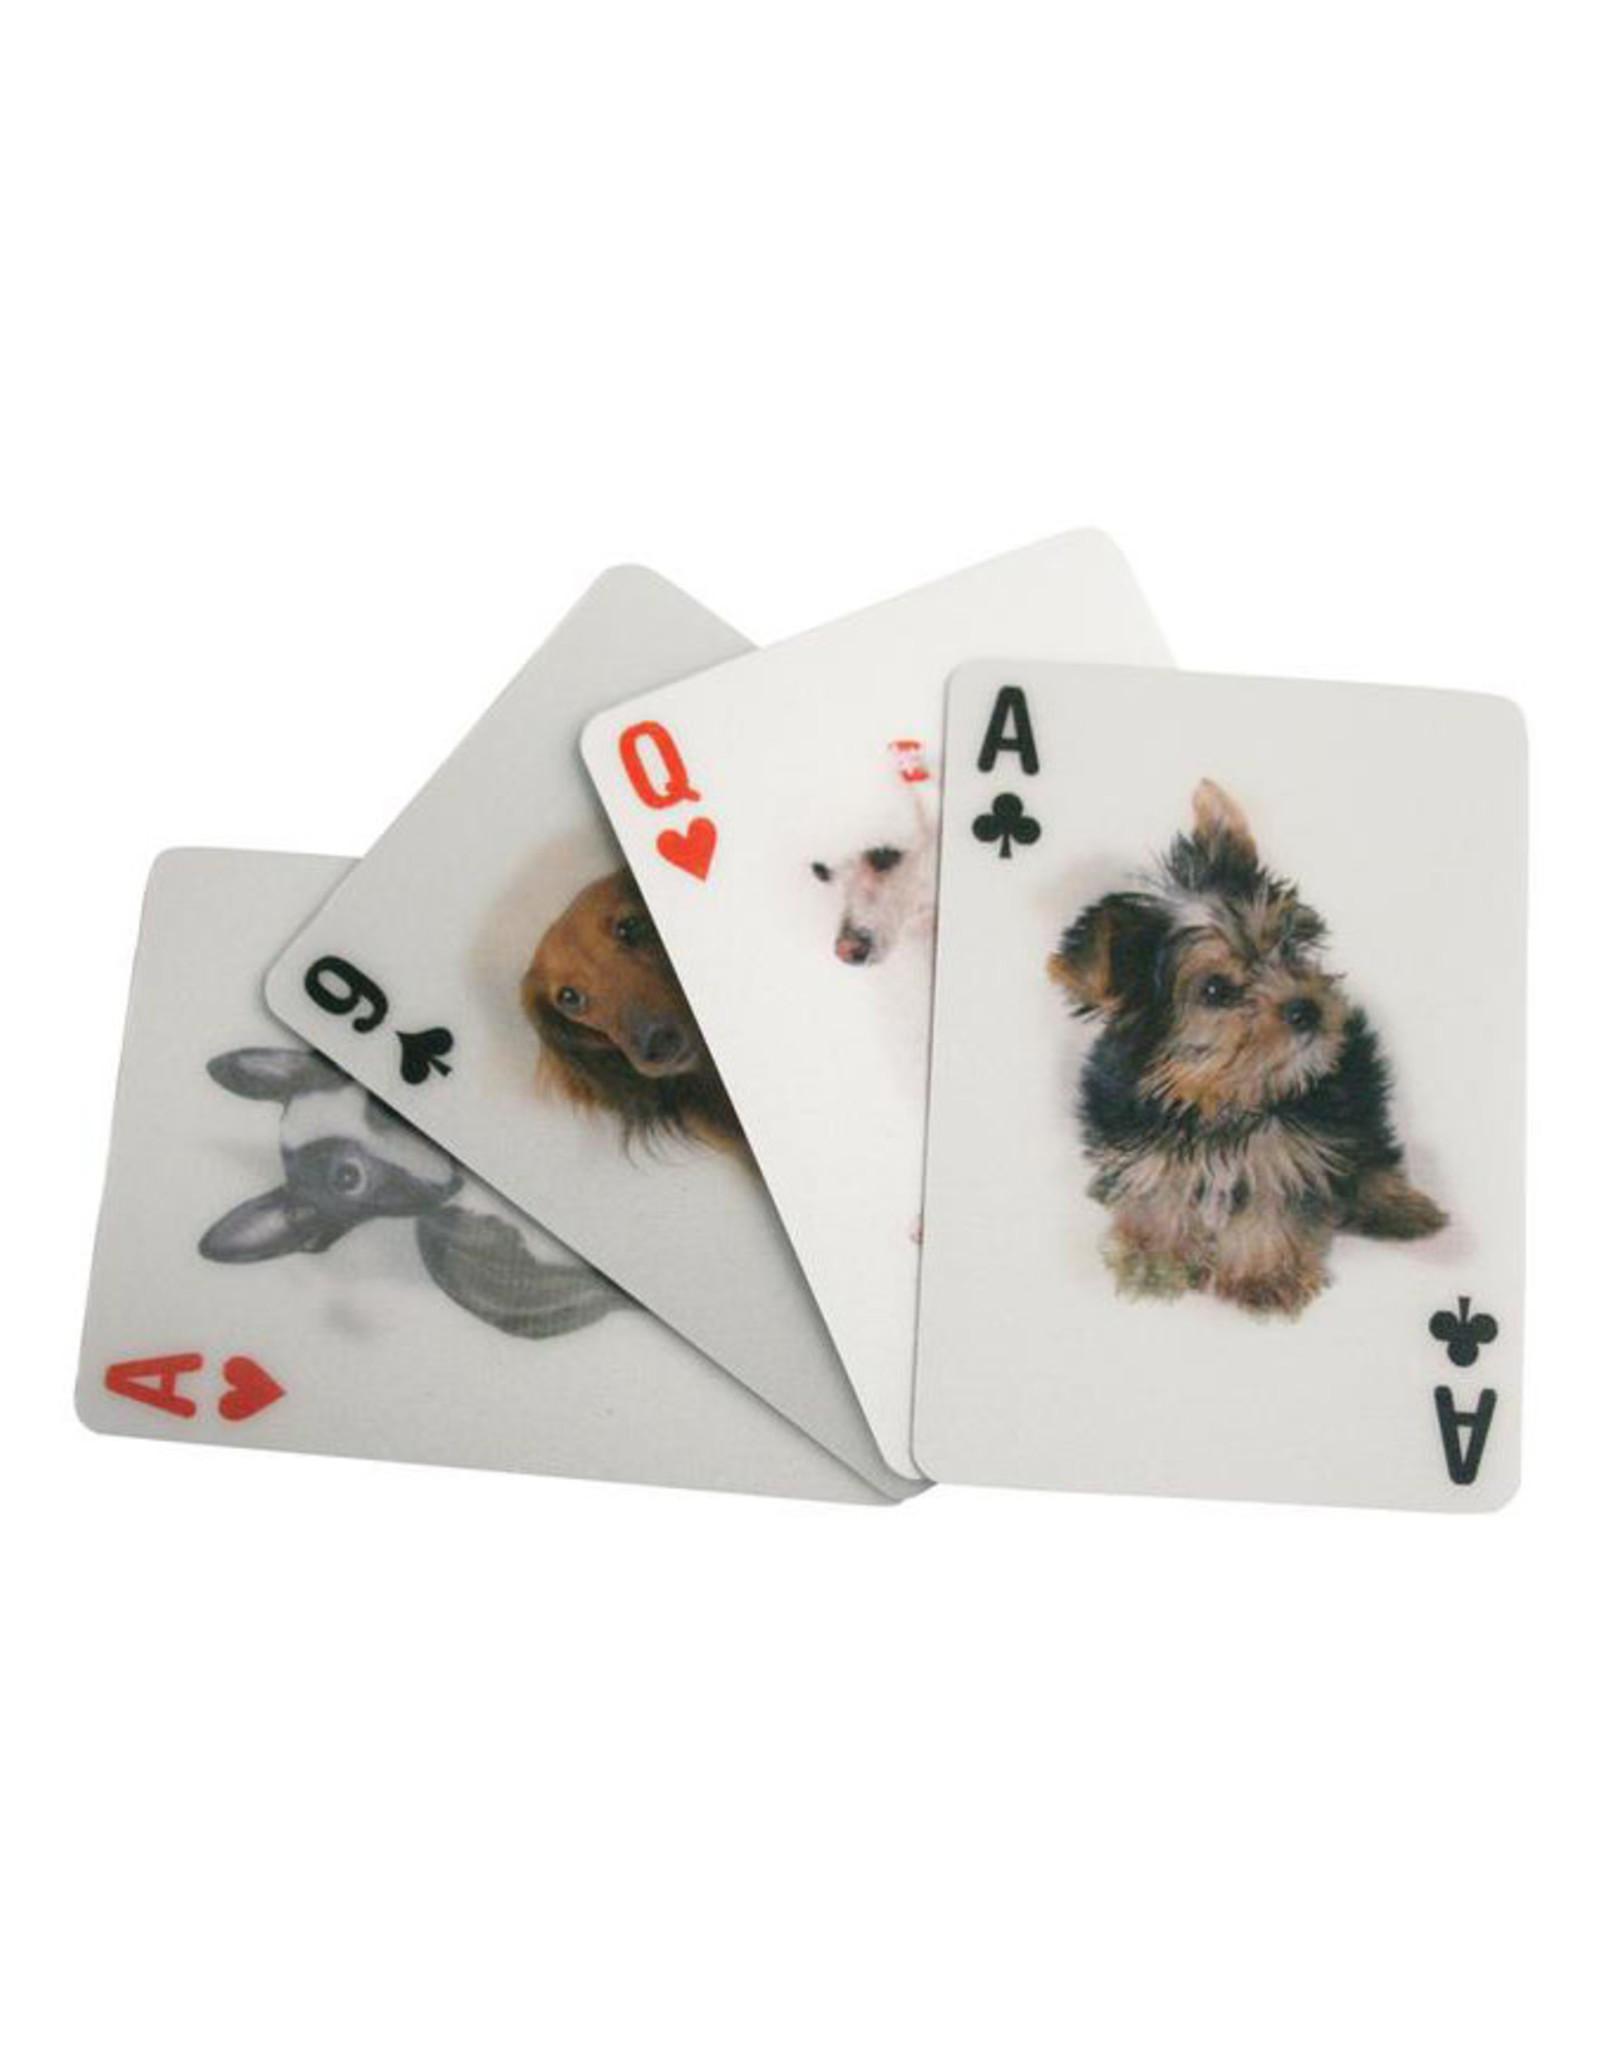 Kikkerland Lenticular Dog Playing Cards - Kikkerland